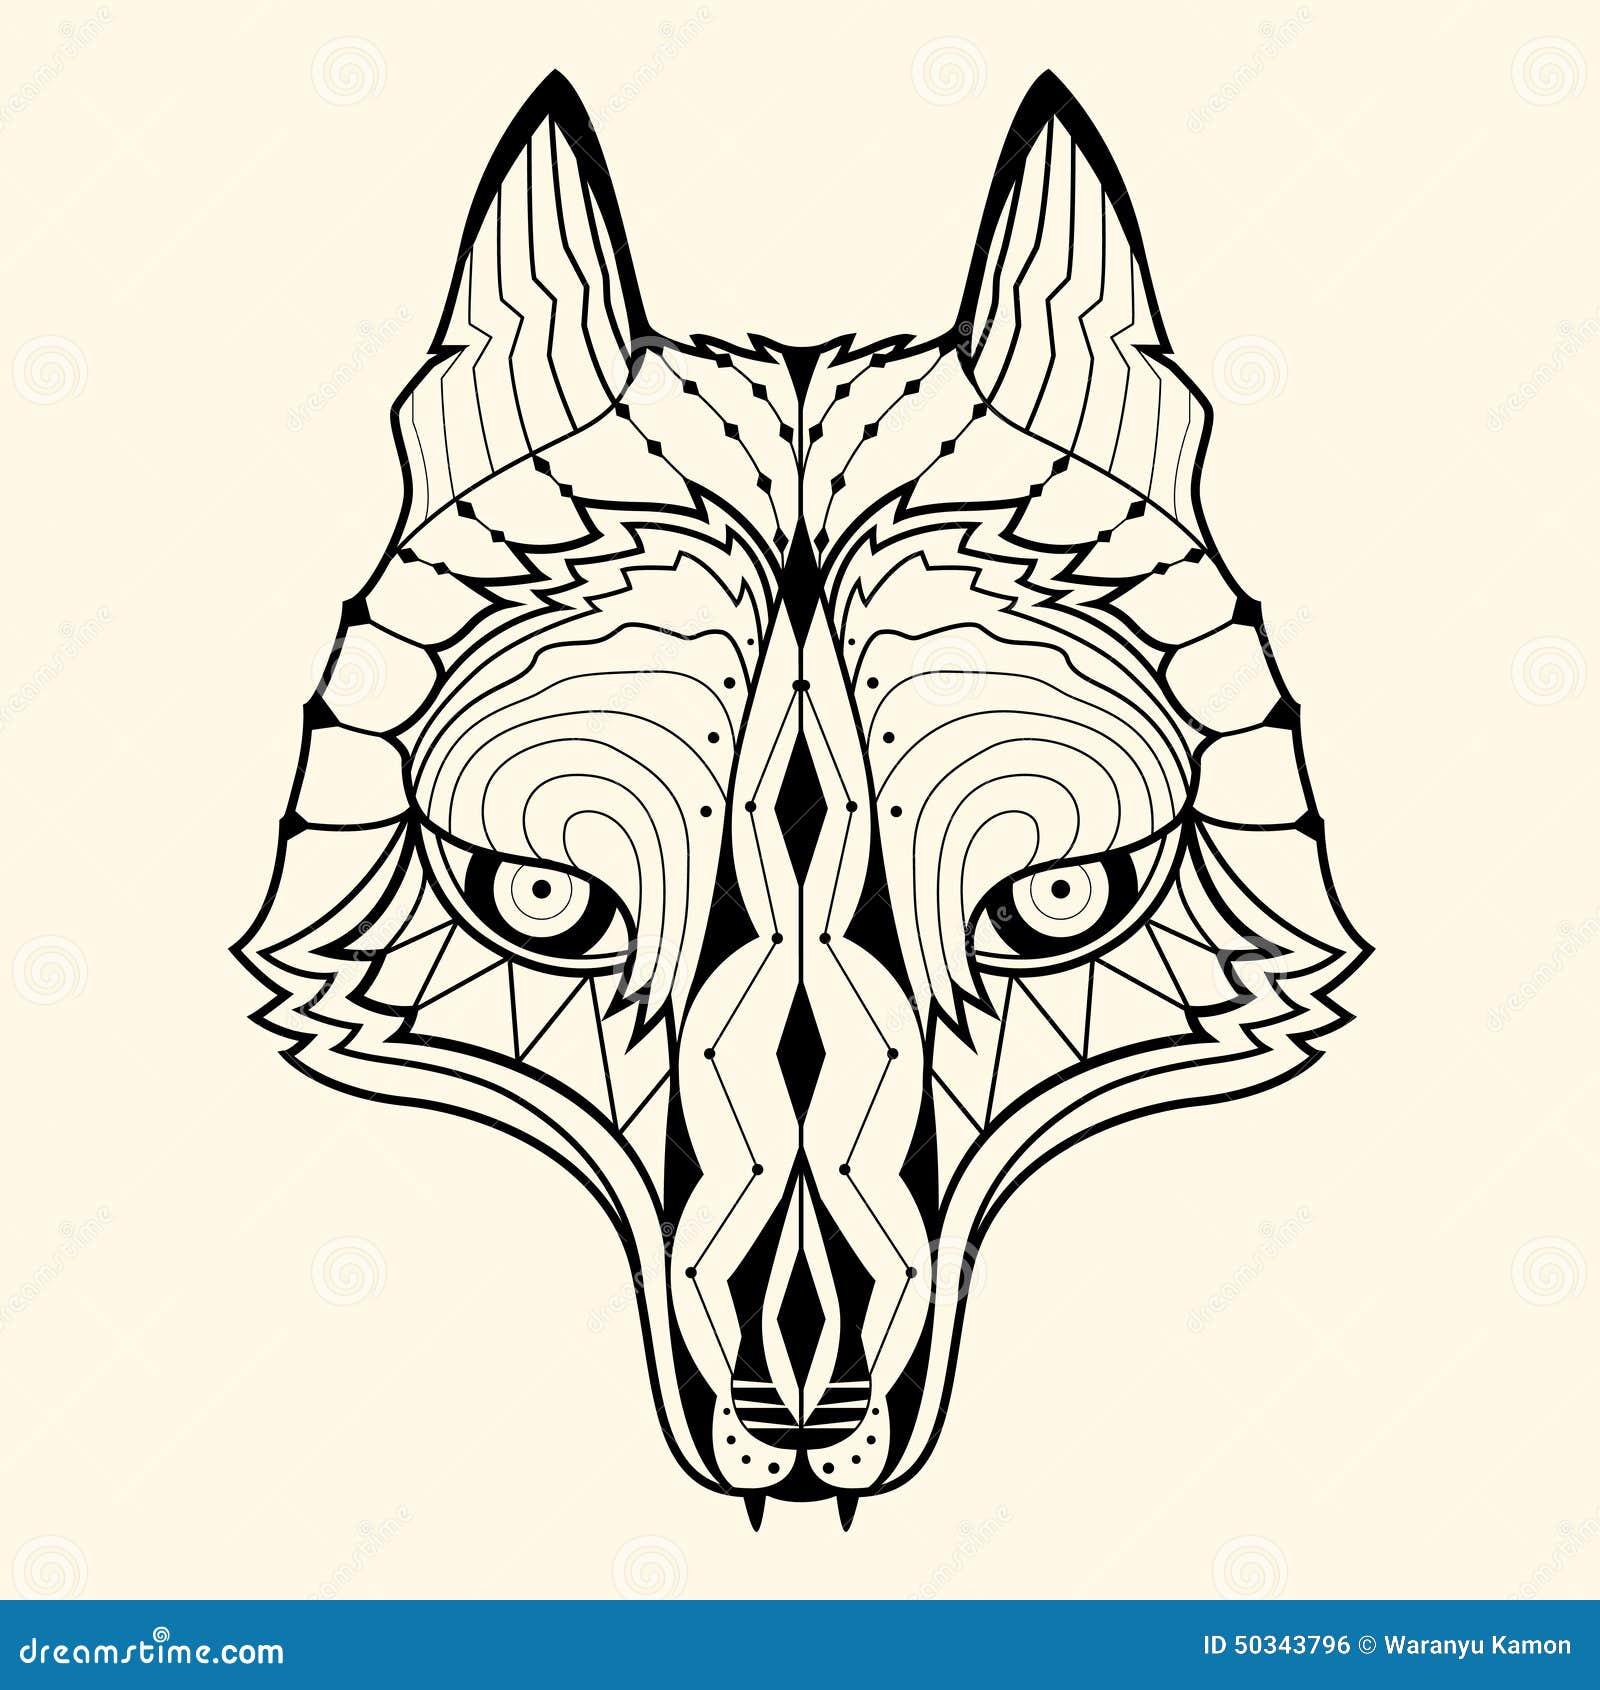 Vector Illustration Web Designs: Wolf Zentangle Stock Vector. Illustration Of Graphic